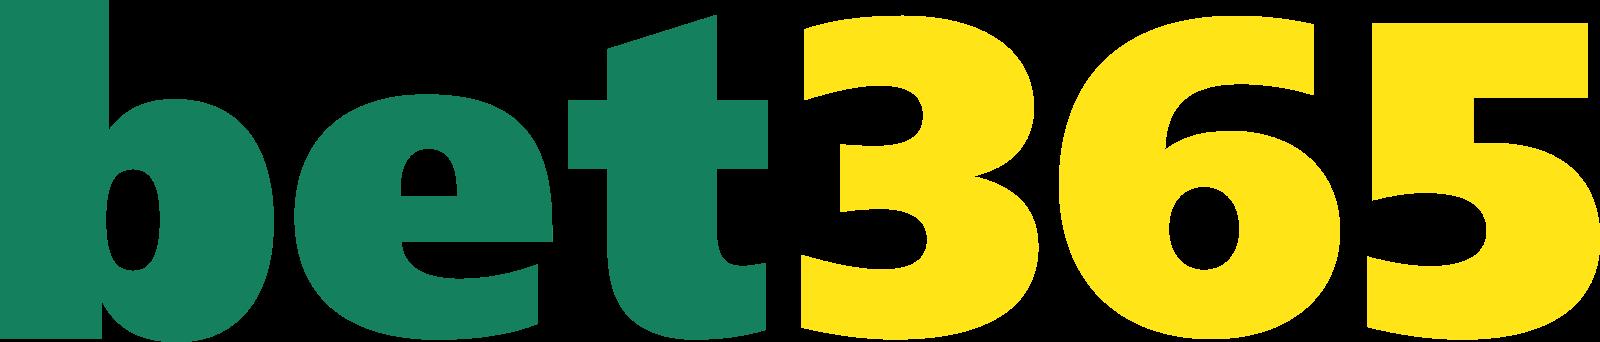 bet365 logo 2 1 - bet365 Logo